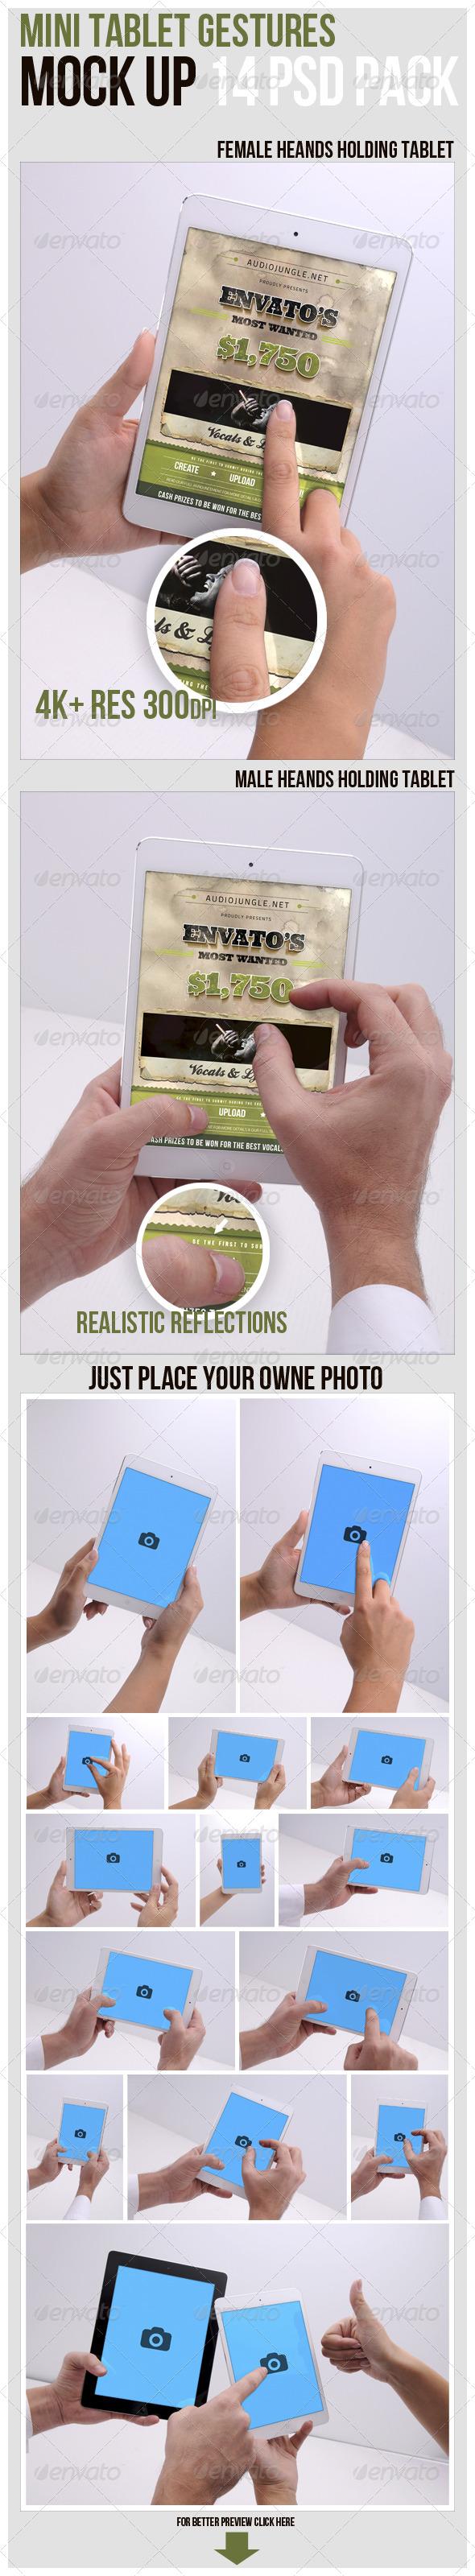 Mini Tablet Gestures Mockup - Displays Product Mock-Ups